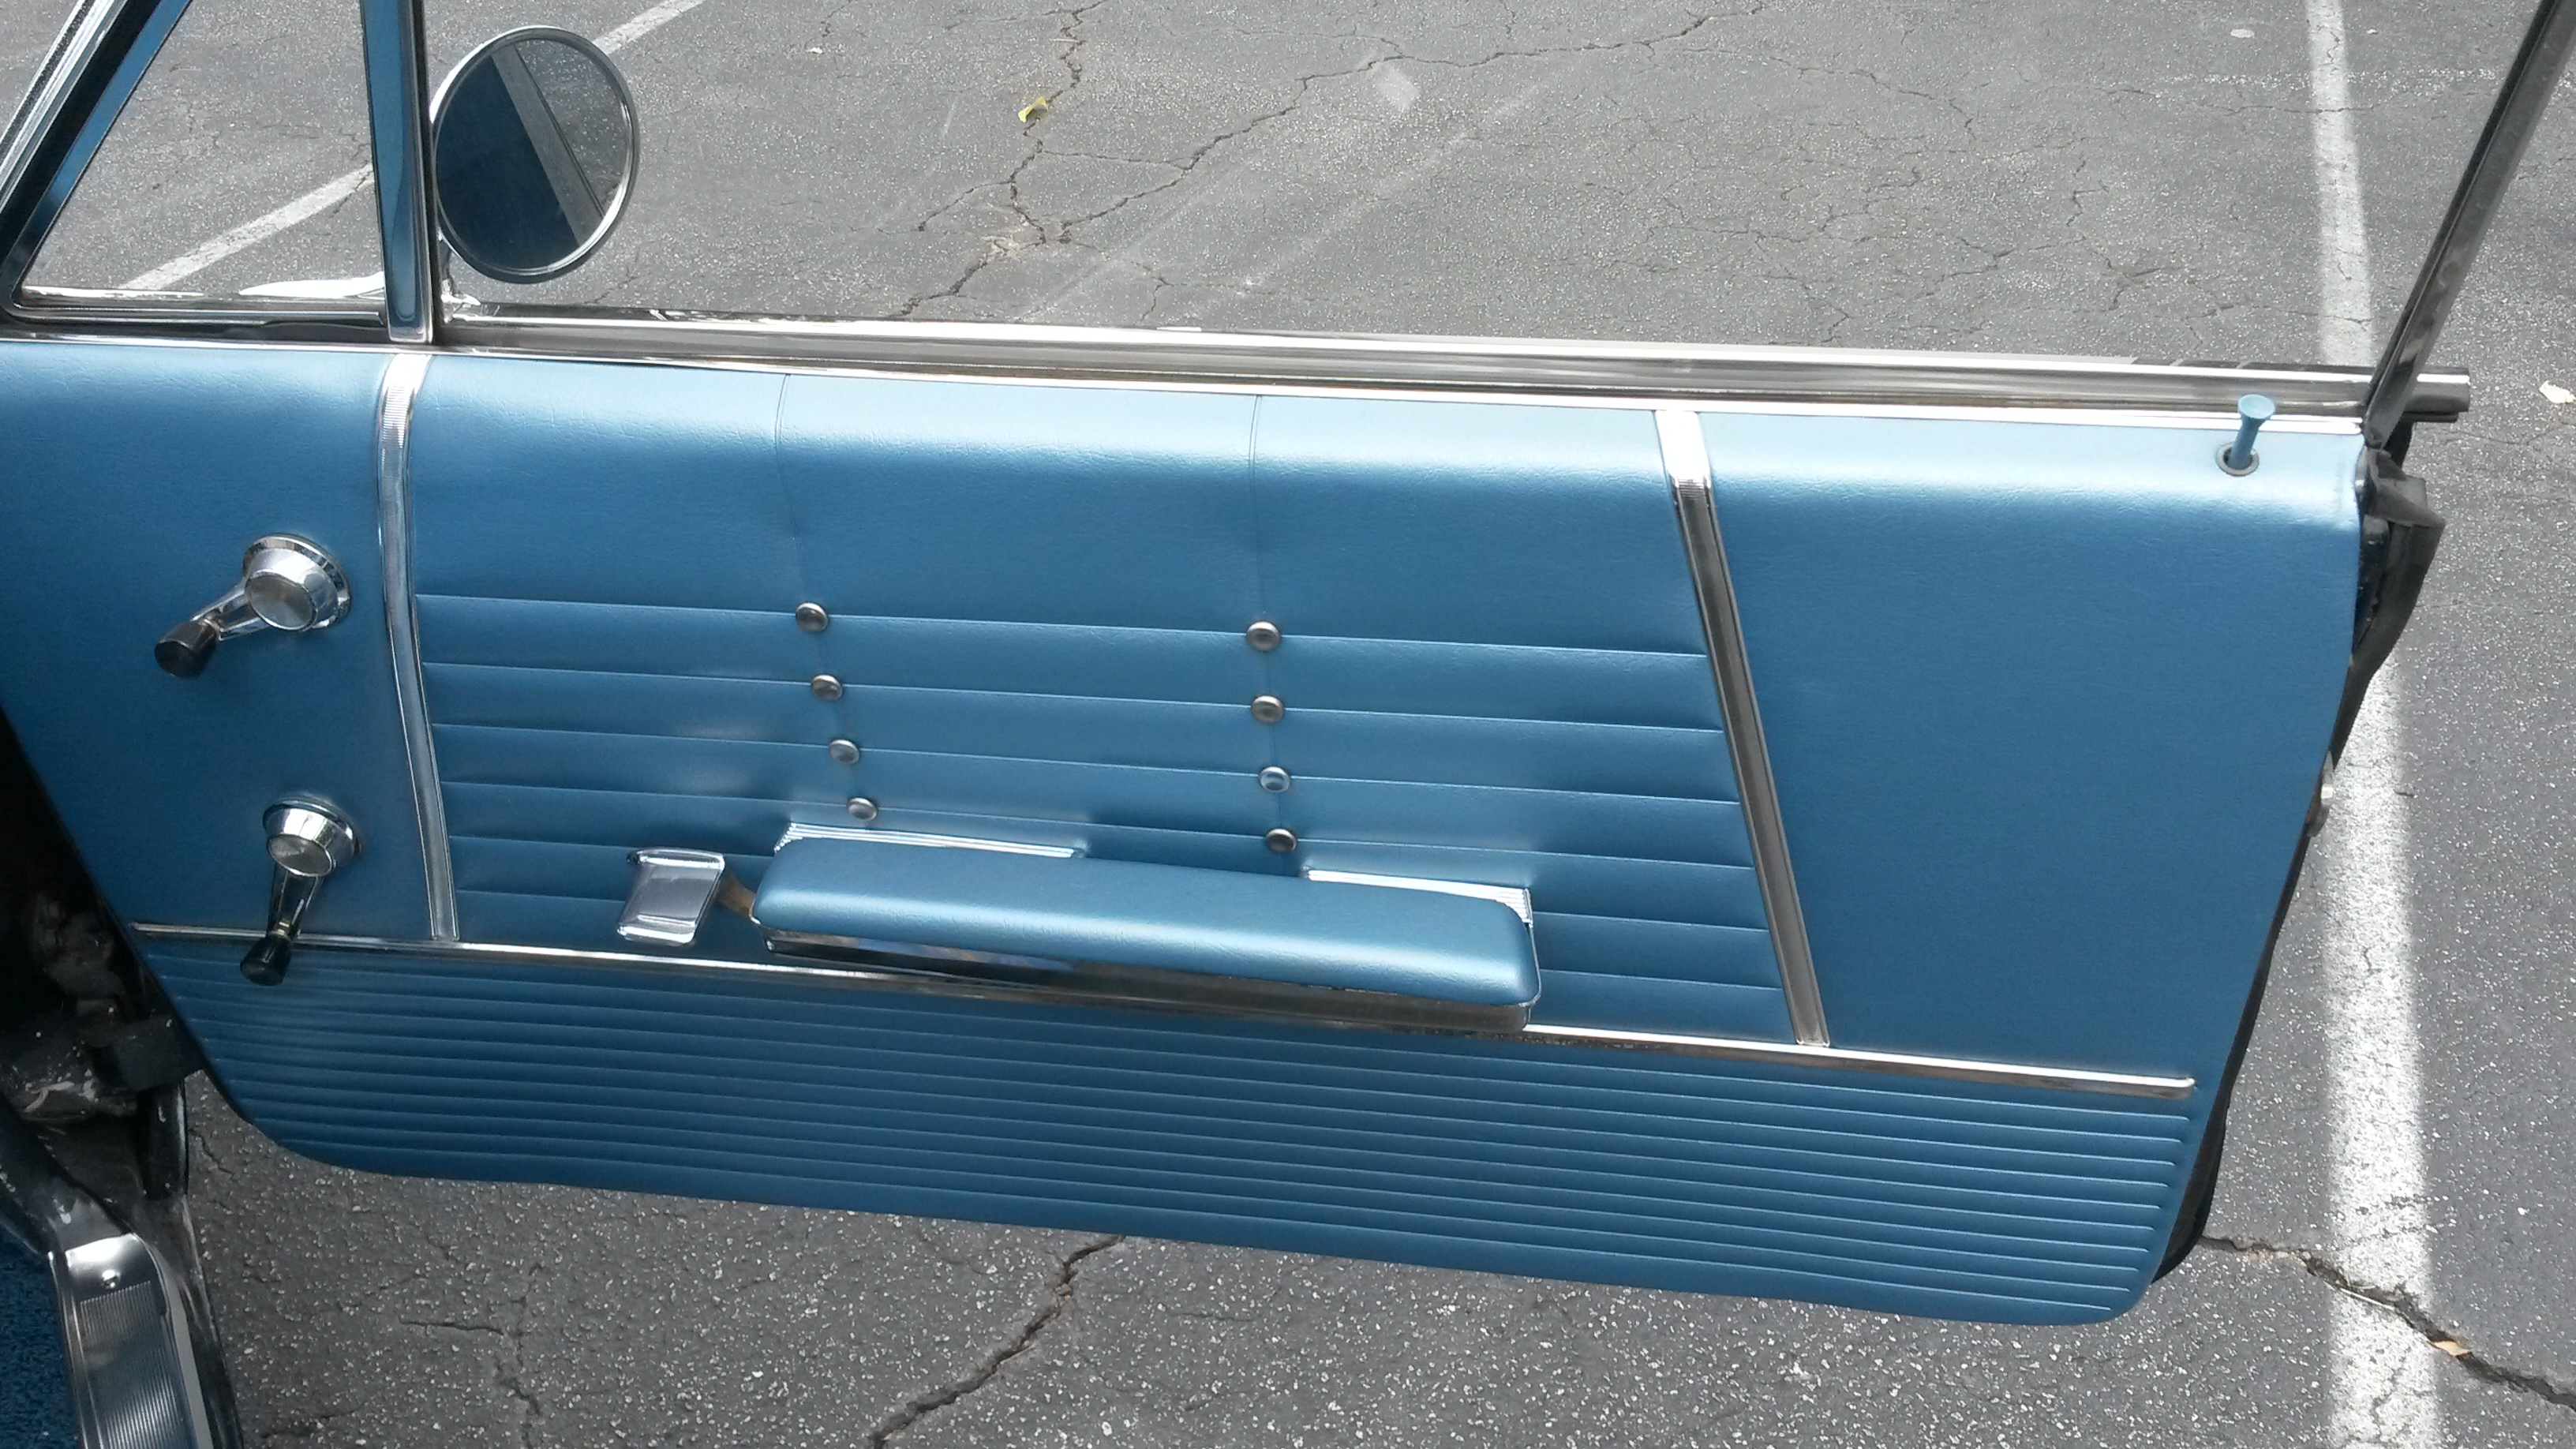 1964 Impala Two Door Hardtop (19)